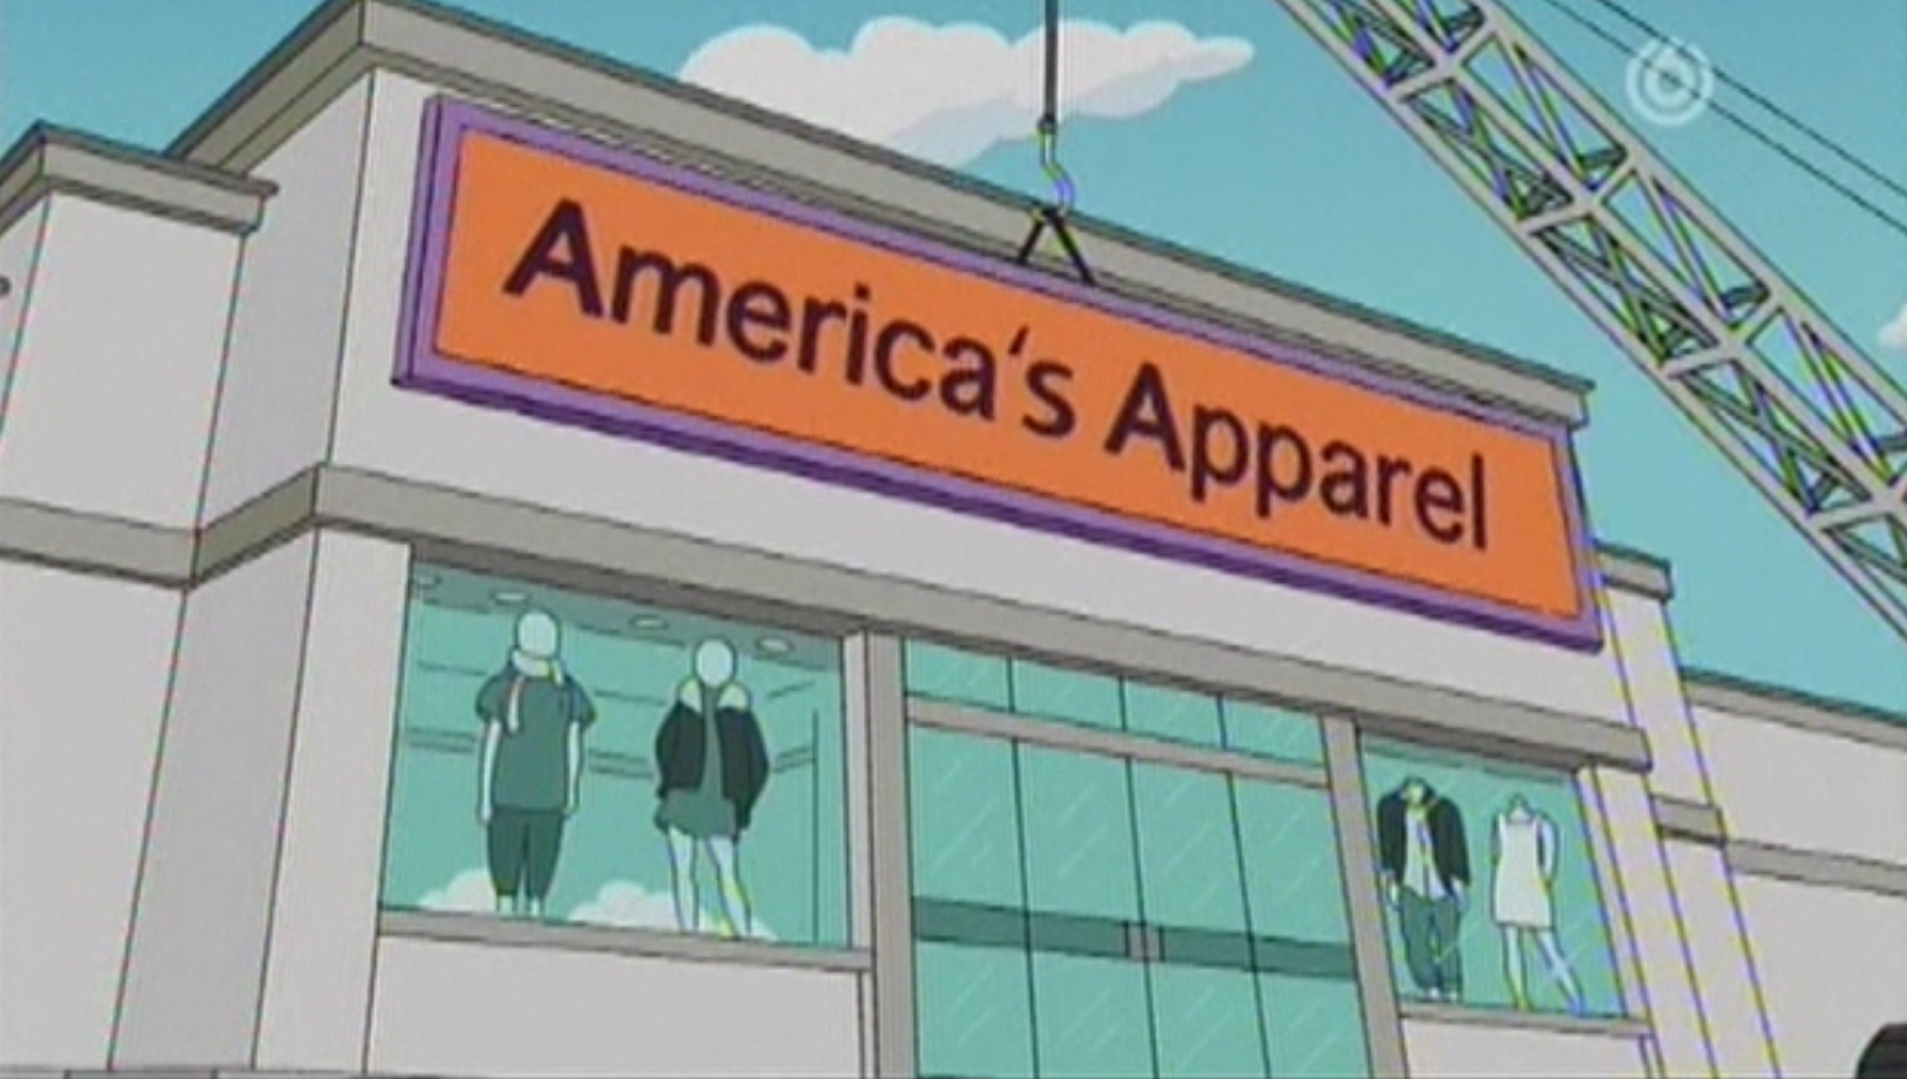 America's Apparel.png